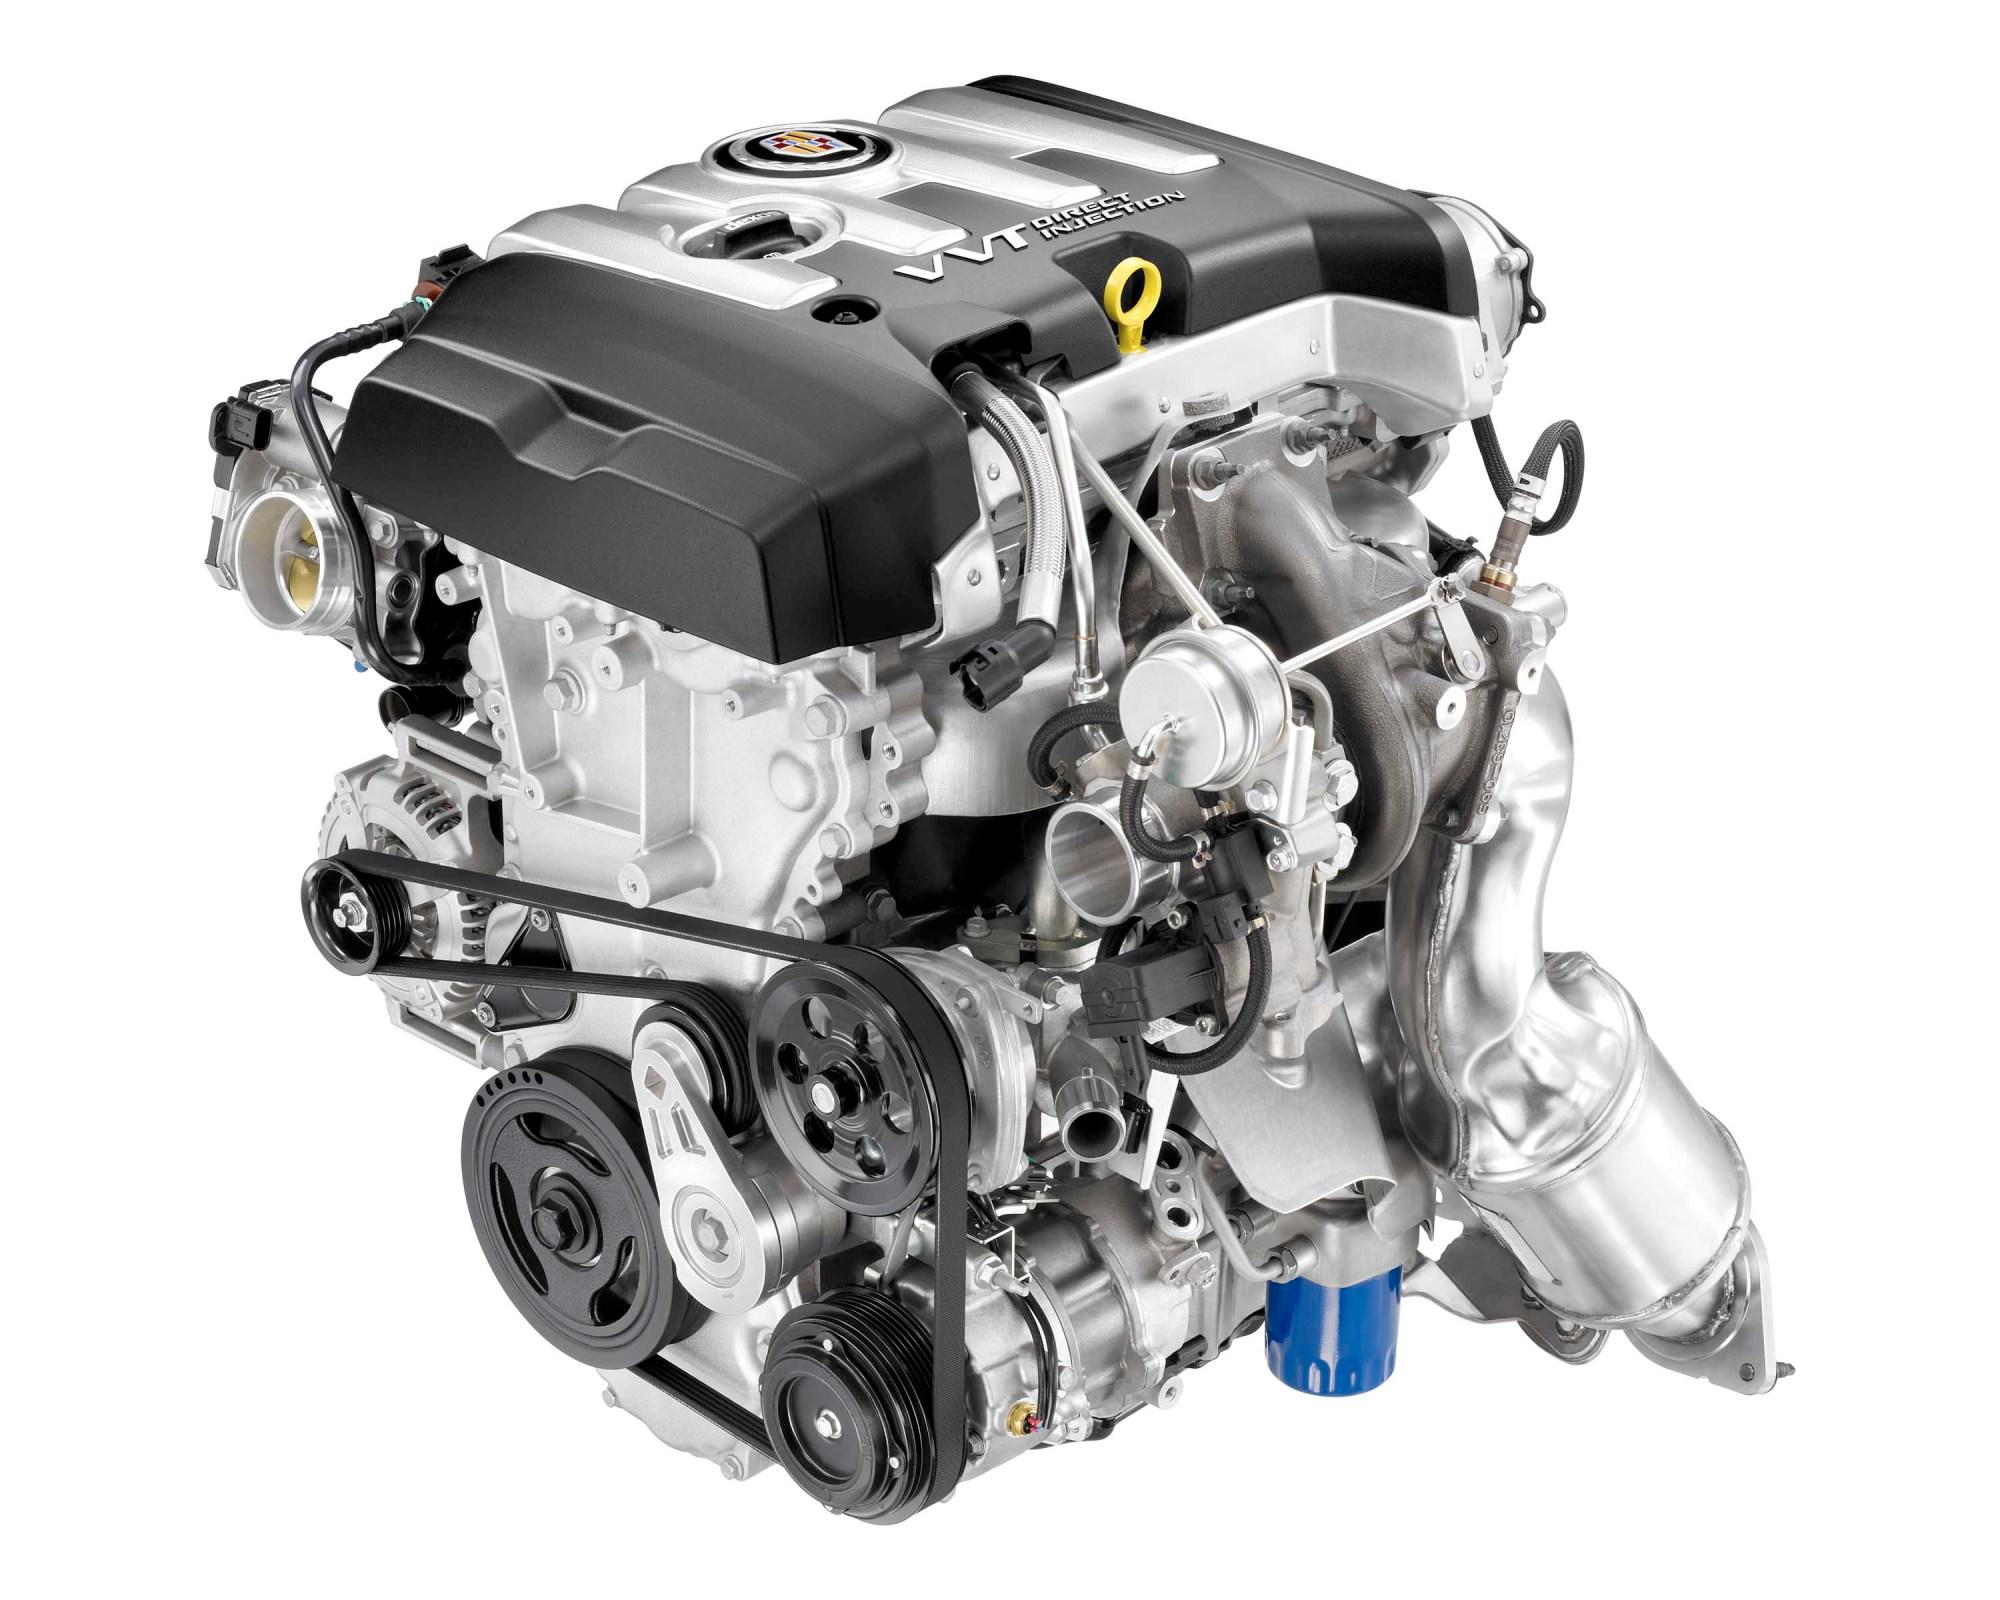 hight resolution of cadillac ats turbo ats 3 6l or ats v caddyinfo 2008 cadillac escalade engine diagram 2004